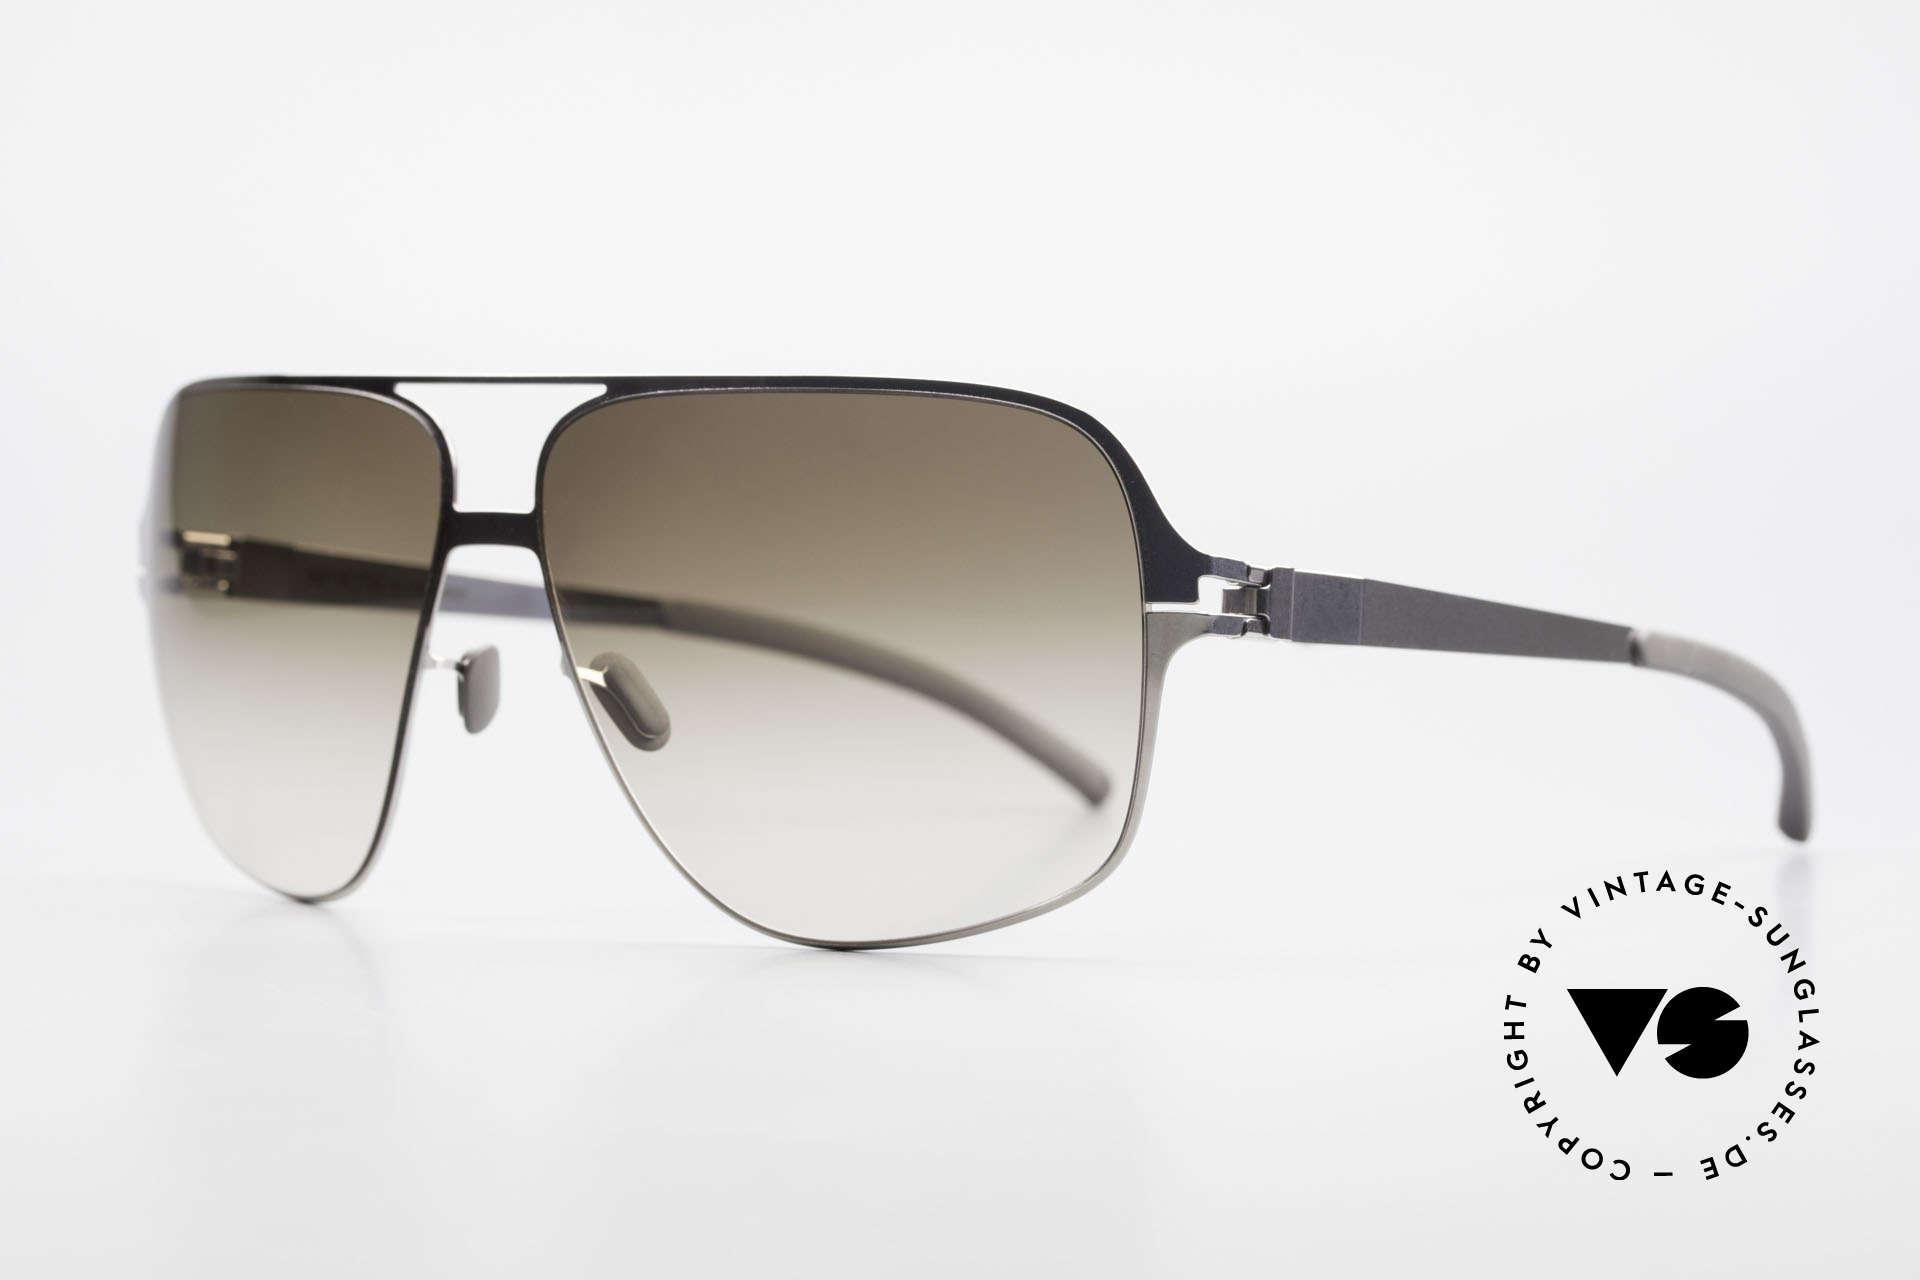 Mykita Cassius Lenny Kravitz Sunglasses XXL, Collect. No.1 Cassius Shinysilver, olive-gradient, 64/13, Made for Men